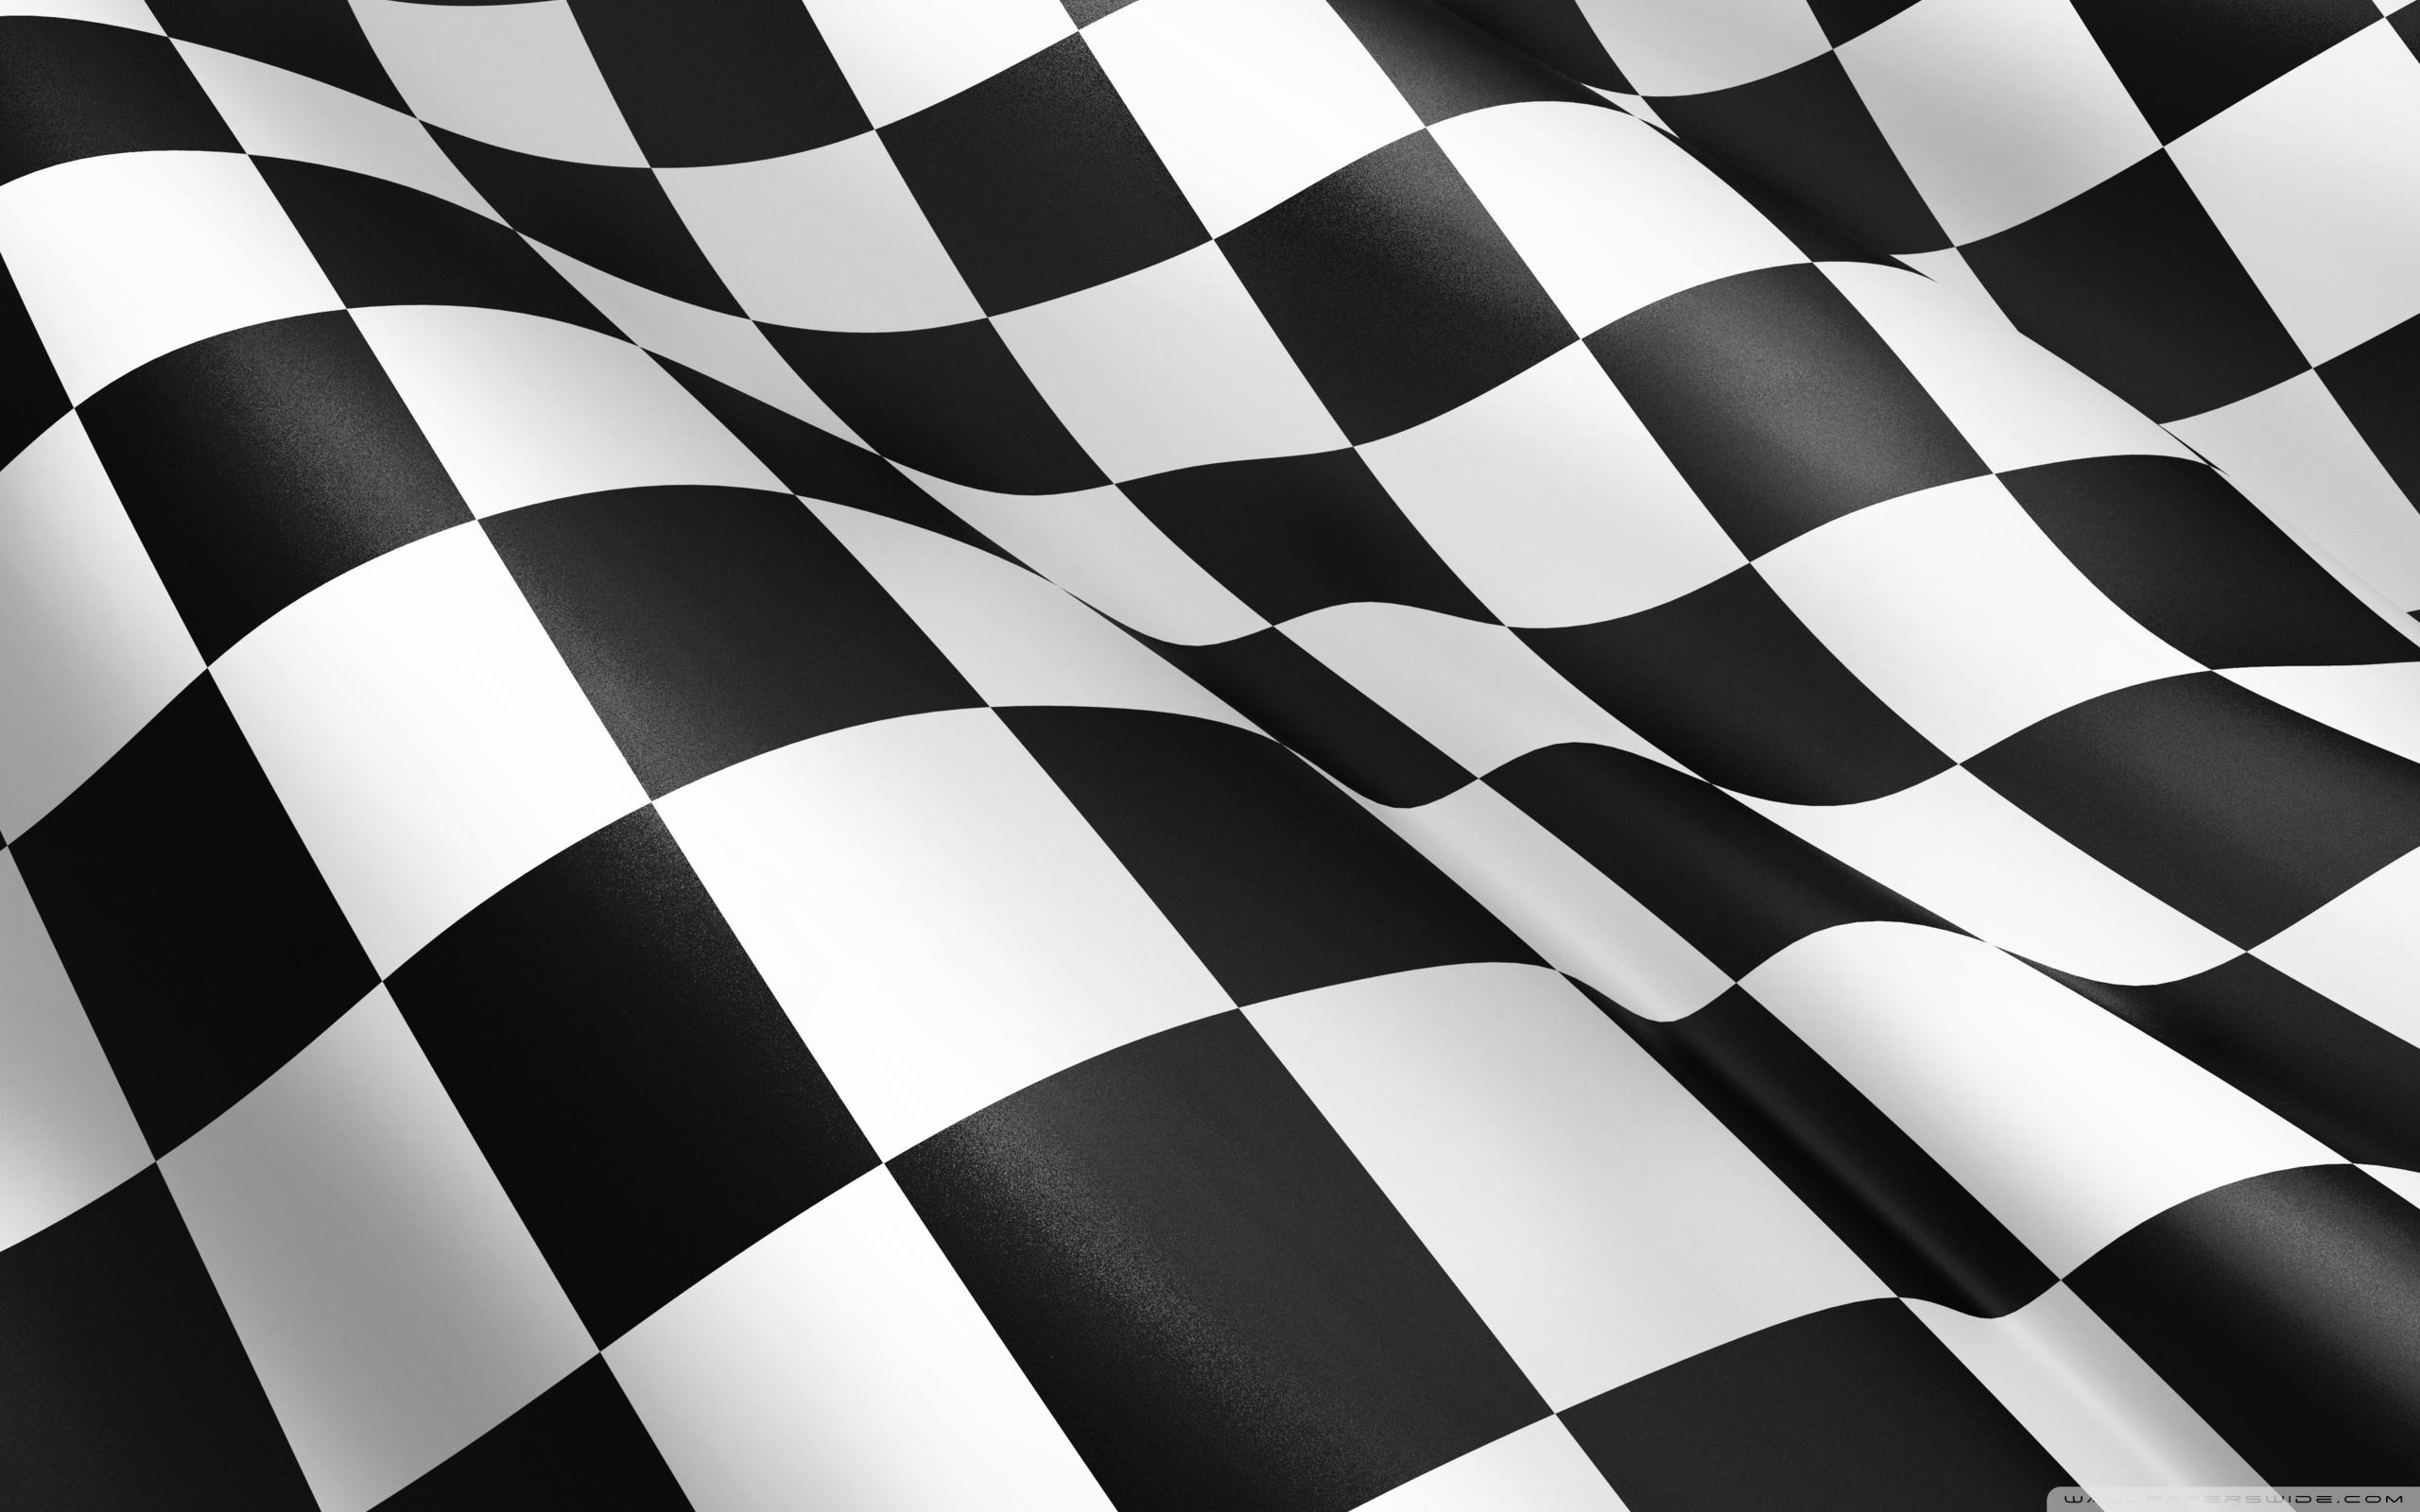 Racing Flag 4K HD Desktop Wallpaper for 4K Ultra HD TV Dual 2560x1600